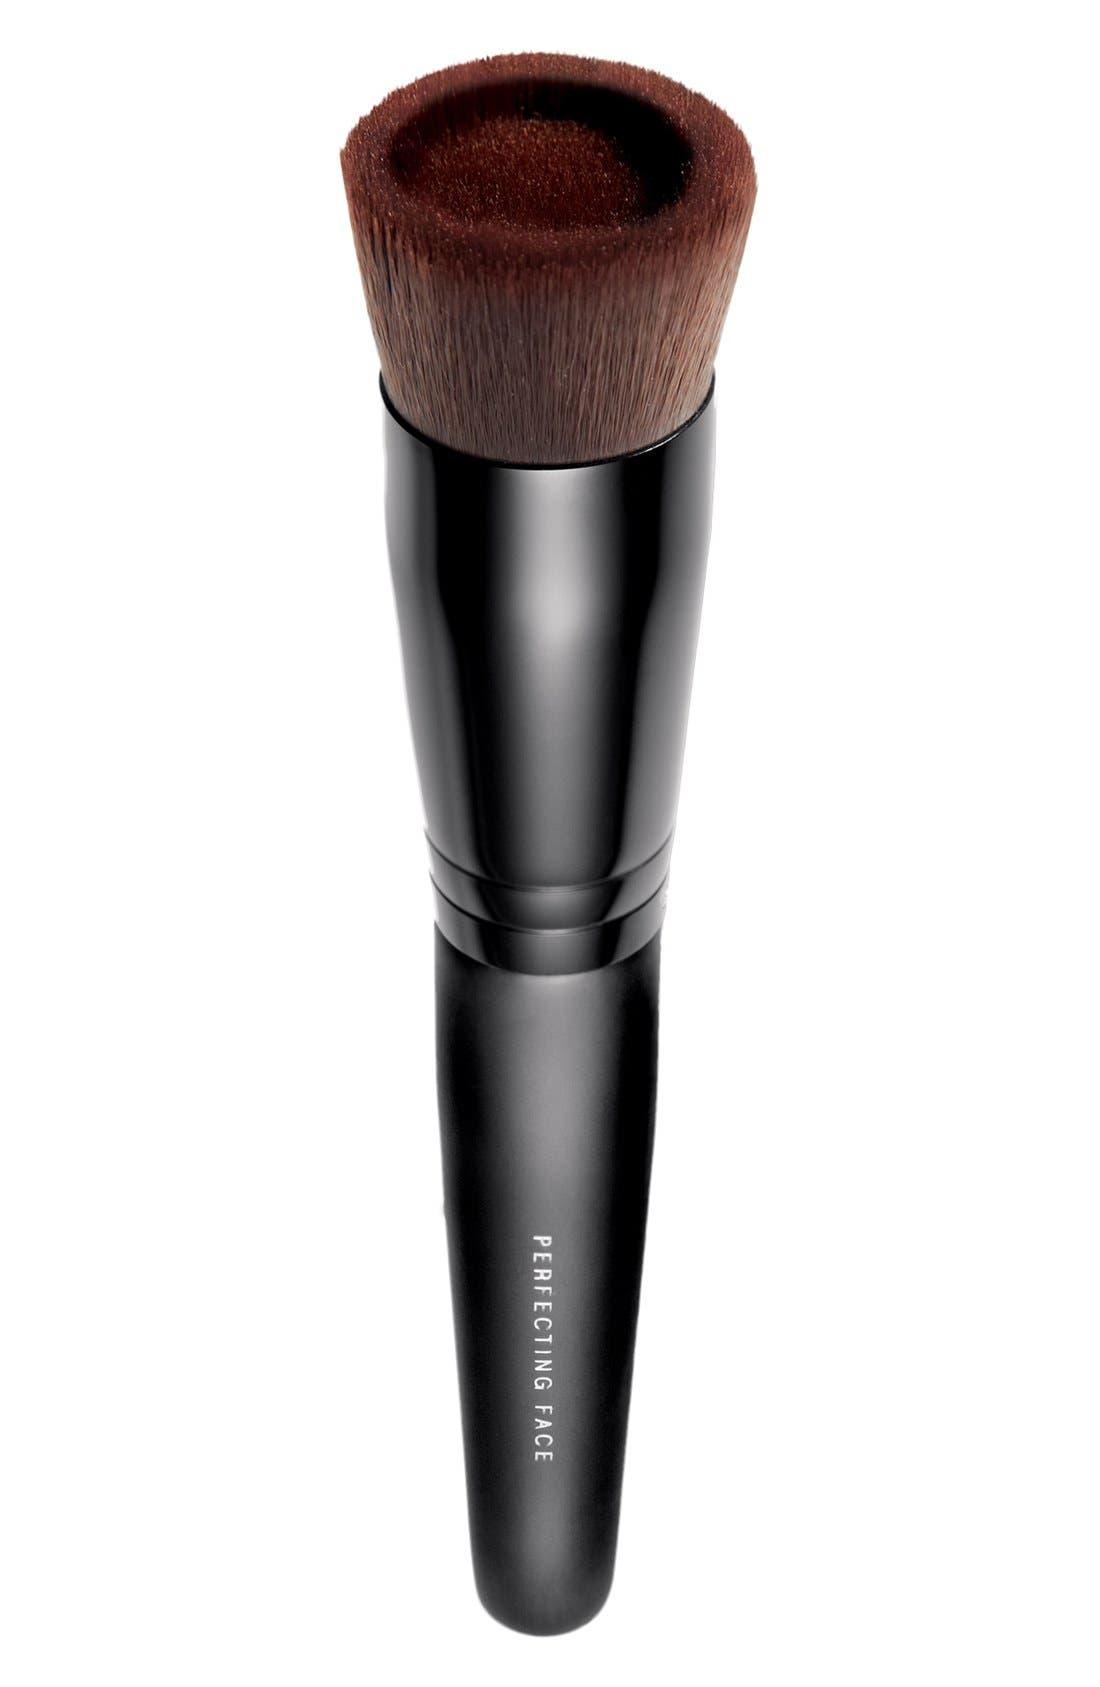 Perfecting Face Brush,                             Main thumbnail 1, color,                             NO COLOR